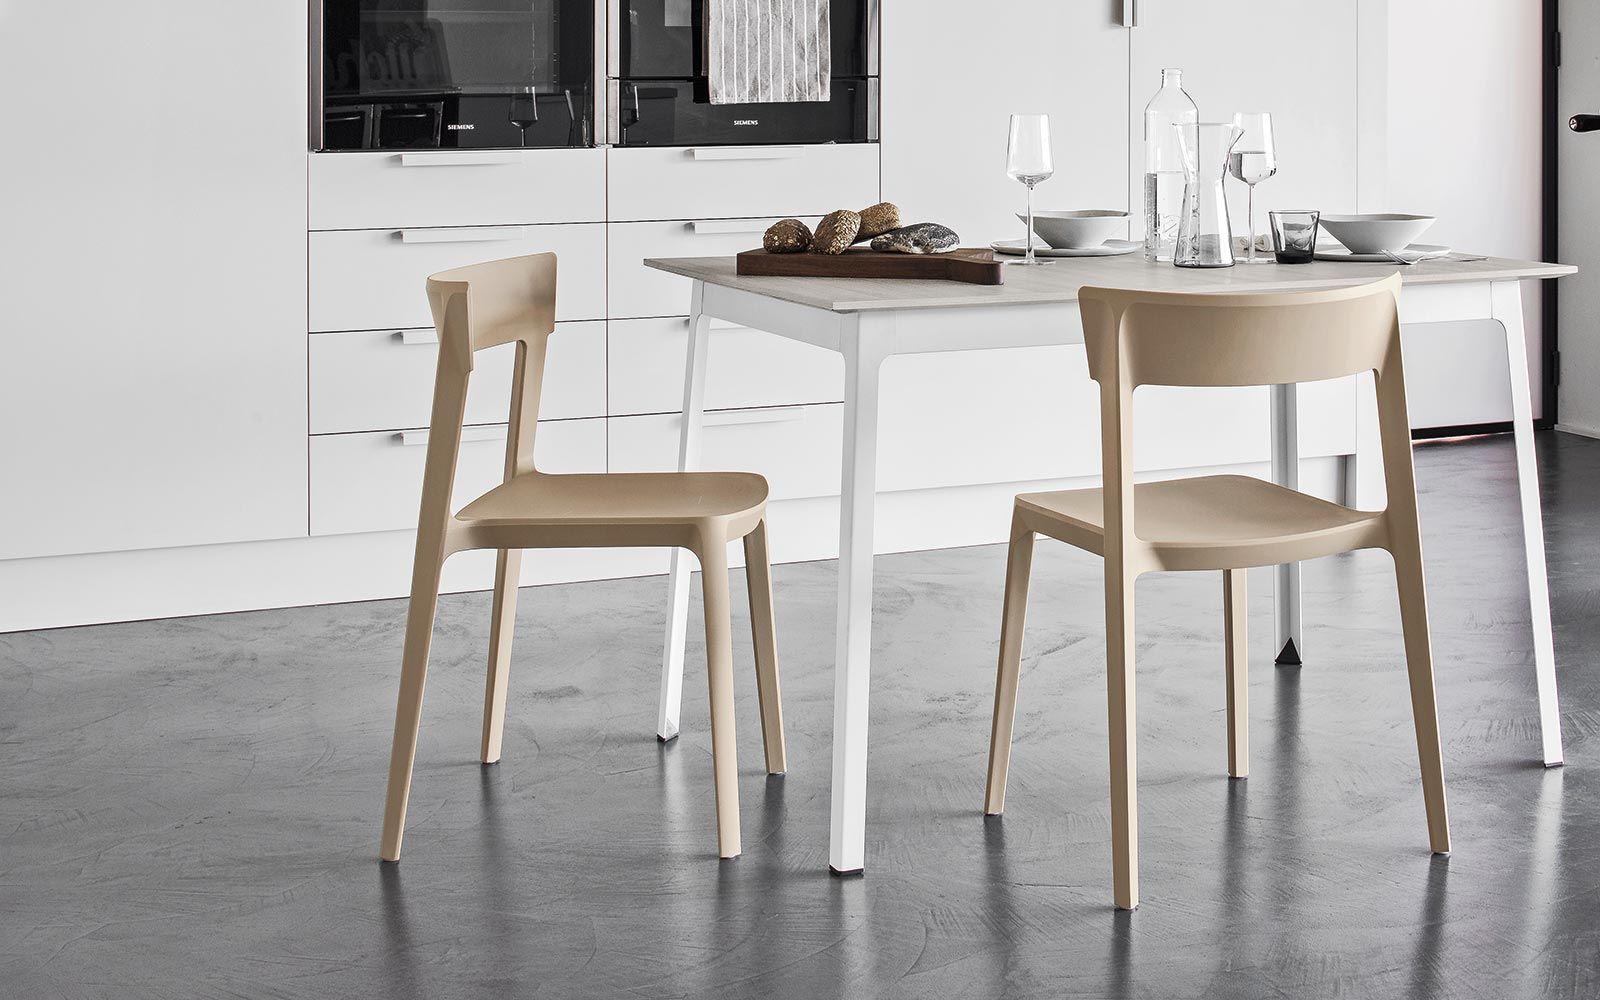 Calligaris - Skin by Archirivolto | seat | chair ...